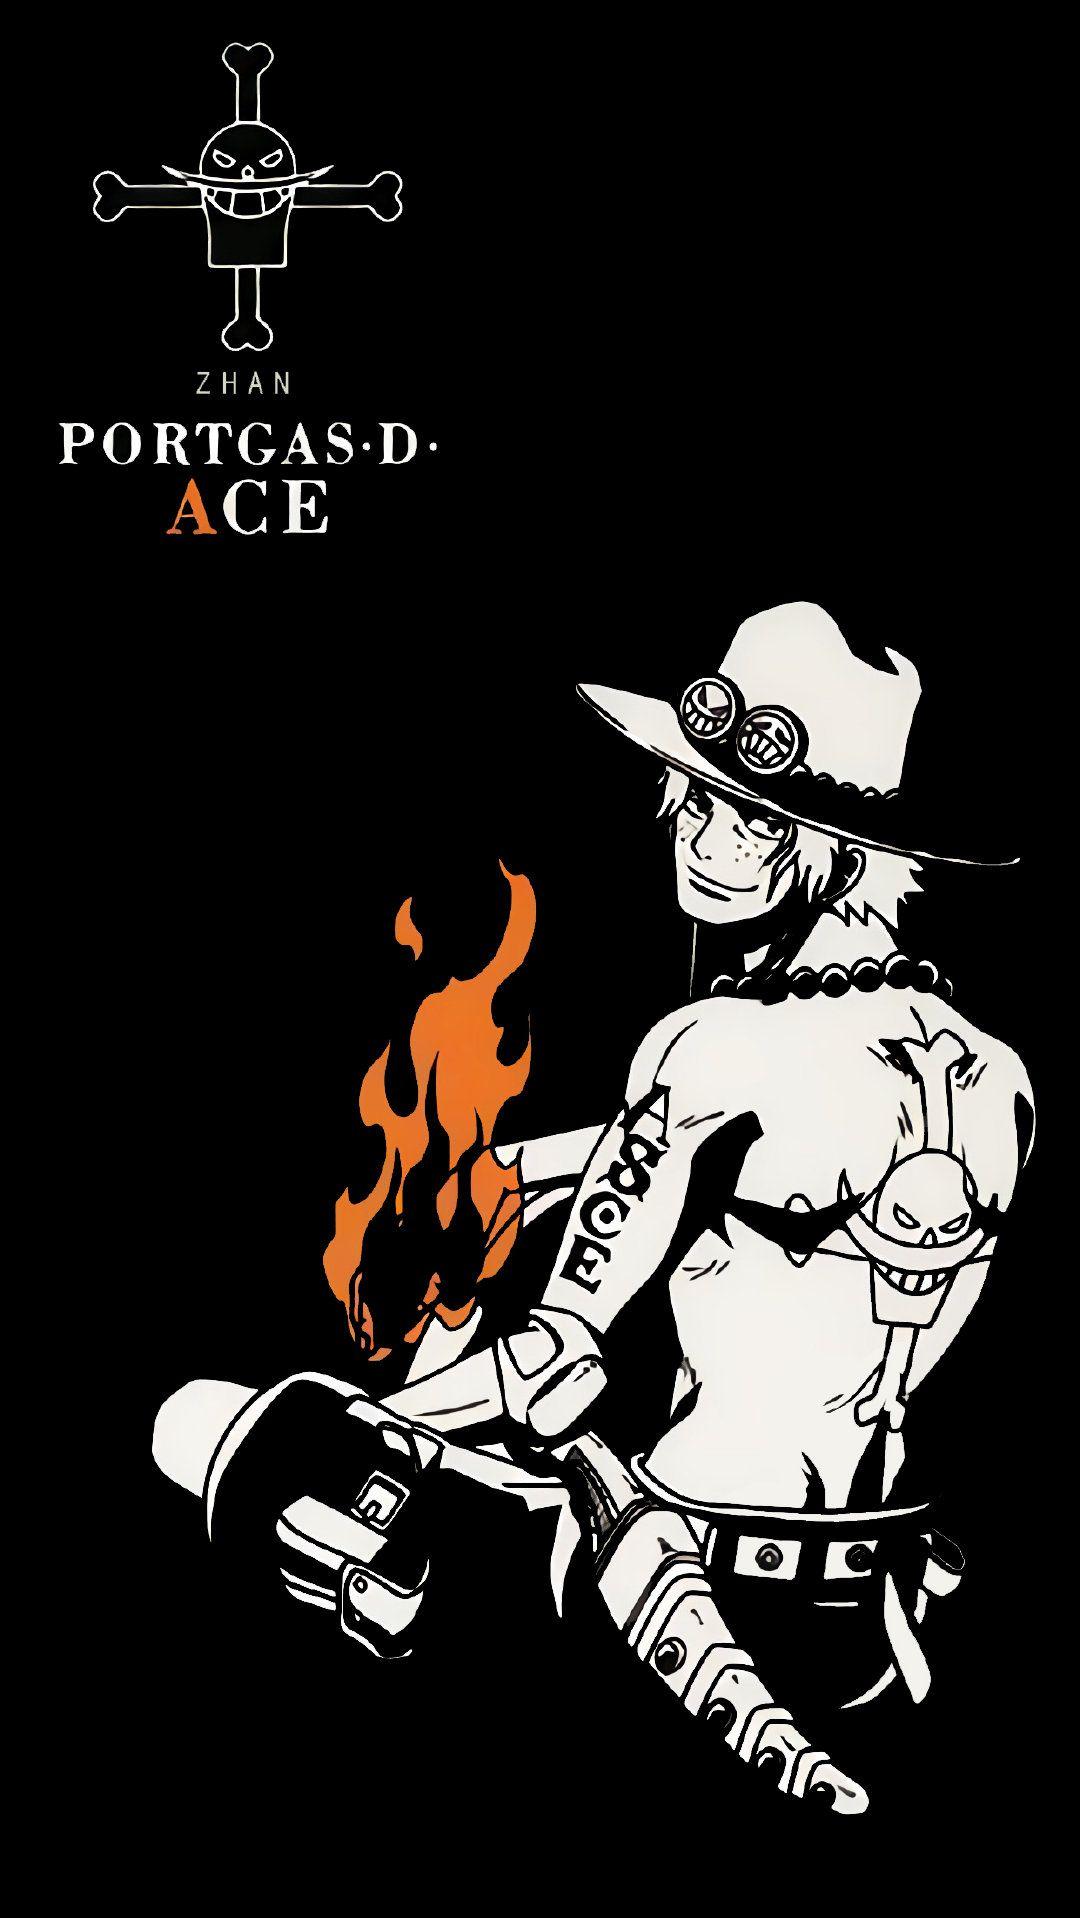 215 Gambar One Piece Terbaik Di 2020